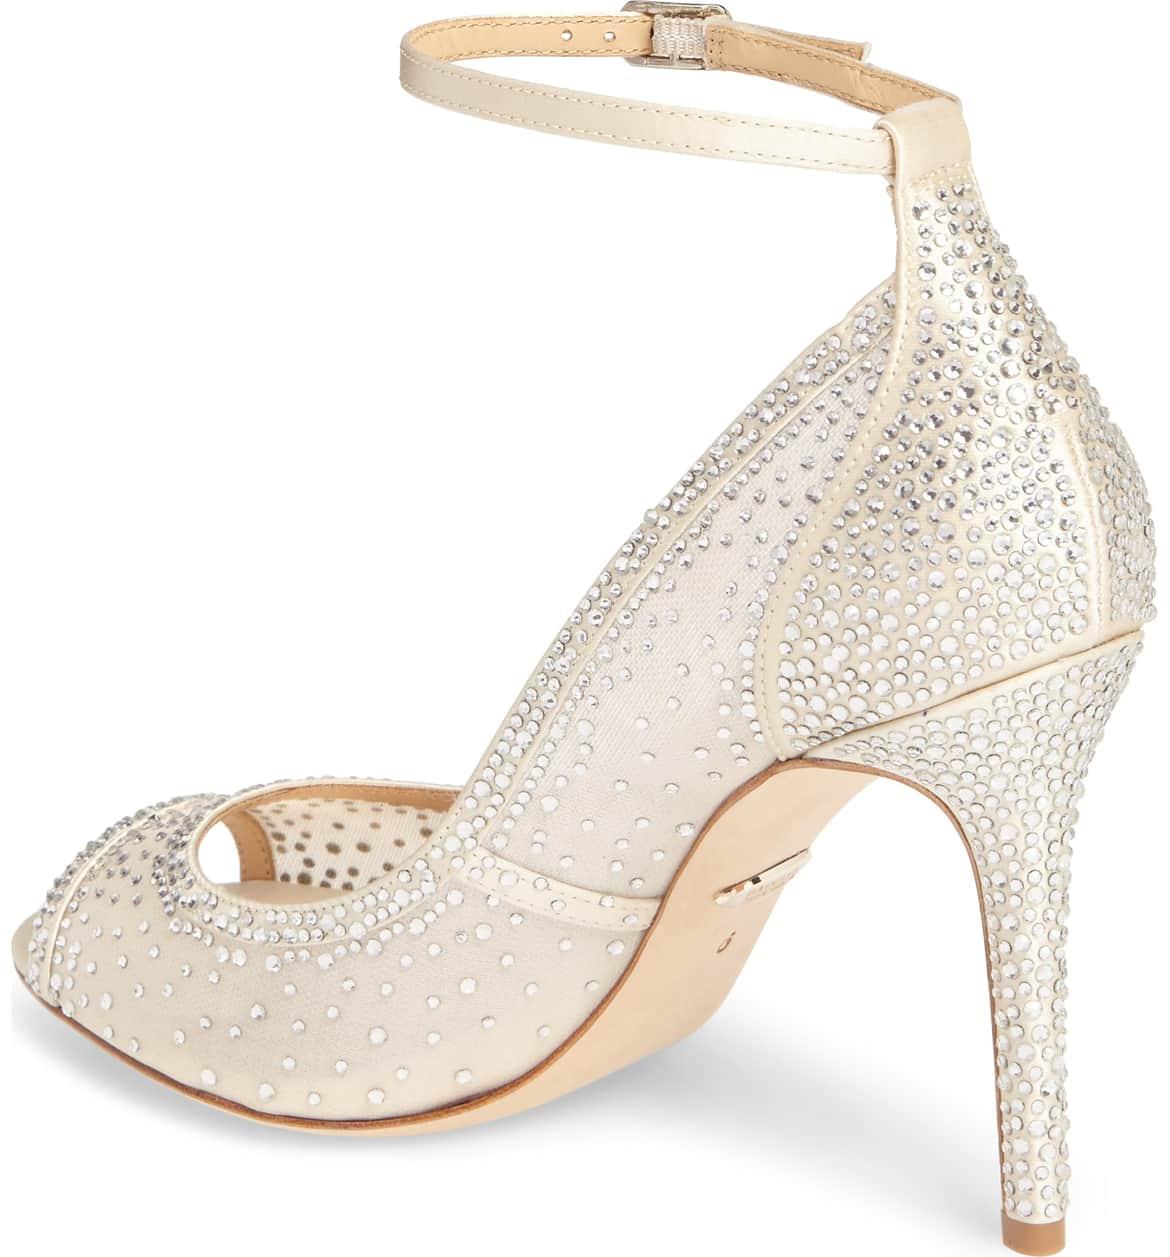 f0aa3697f0a0b BADGLEY MISCHKA Weylin Ankle Strap Heel – CUTE SHOE SHOP